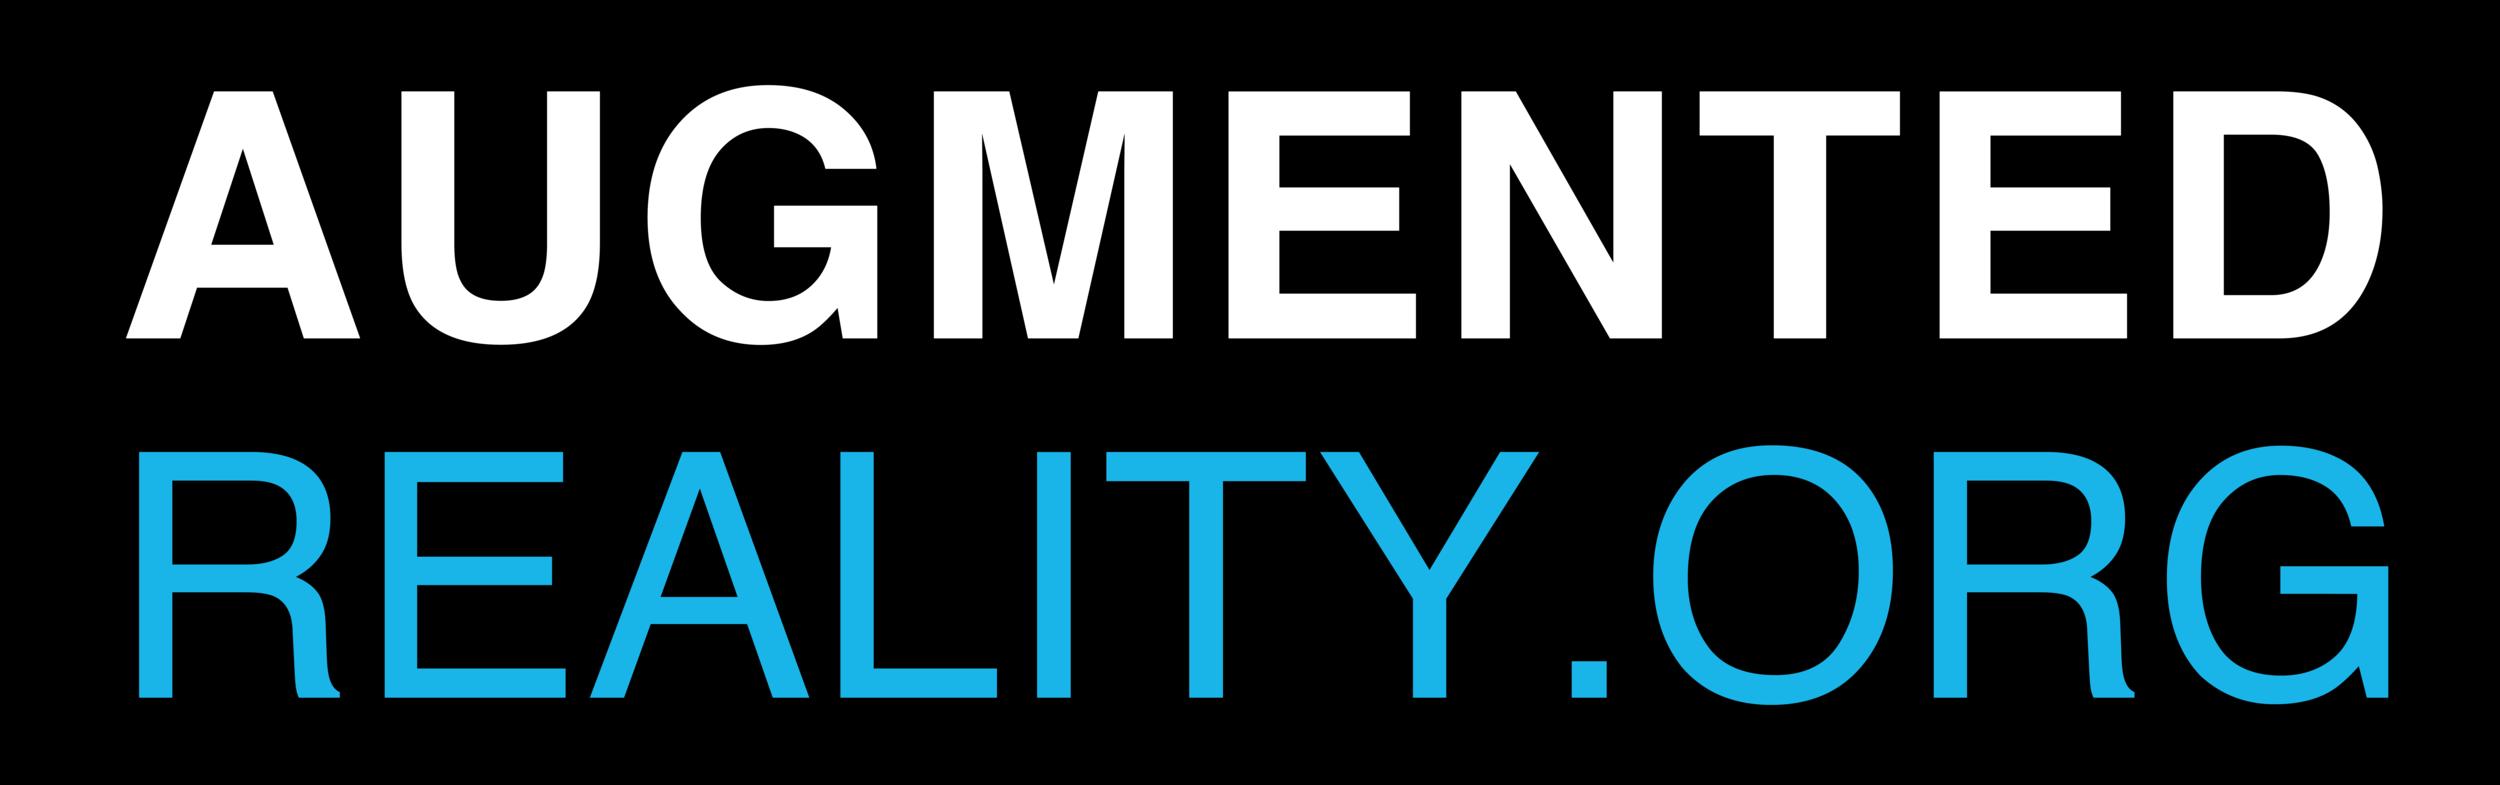 augmentedrealityorg_logo.png